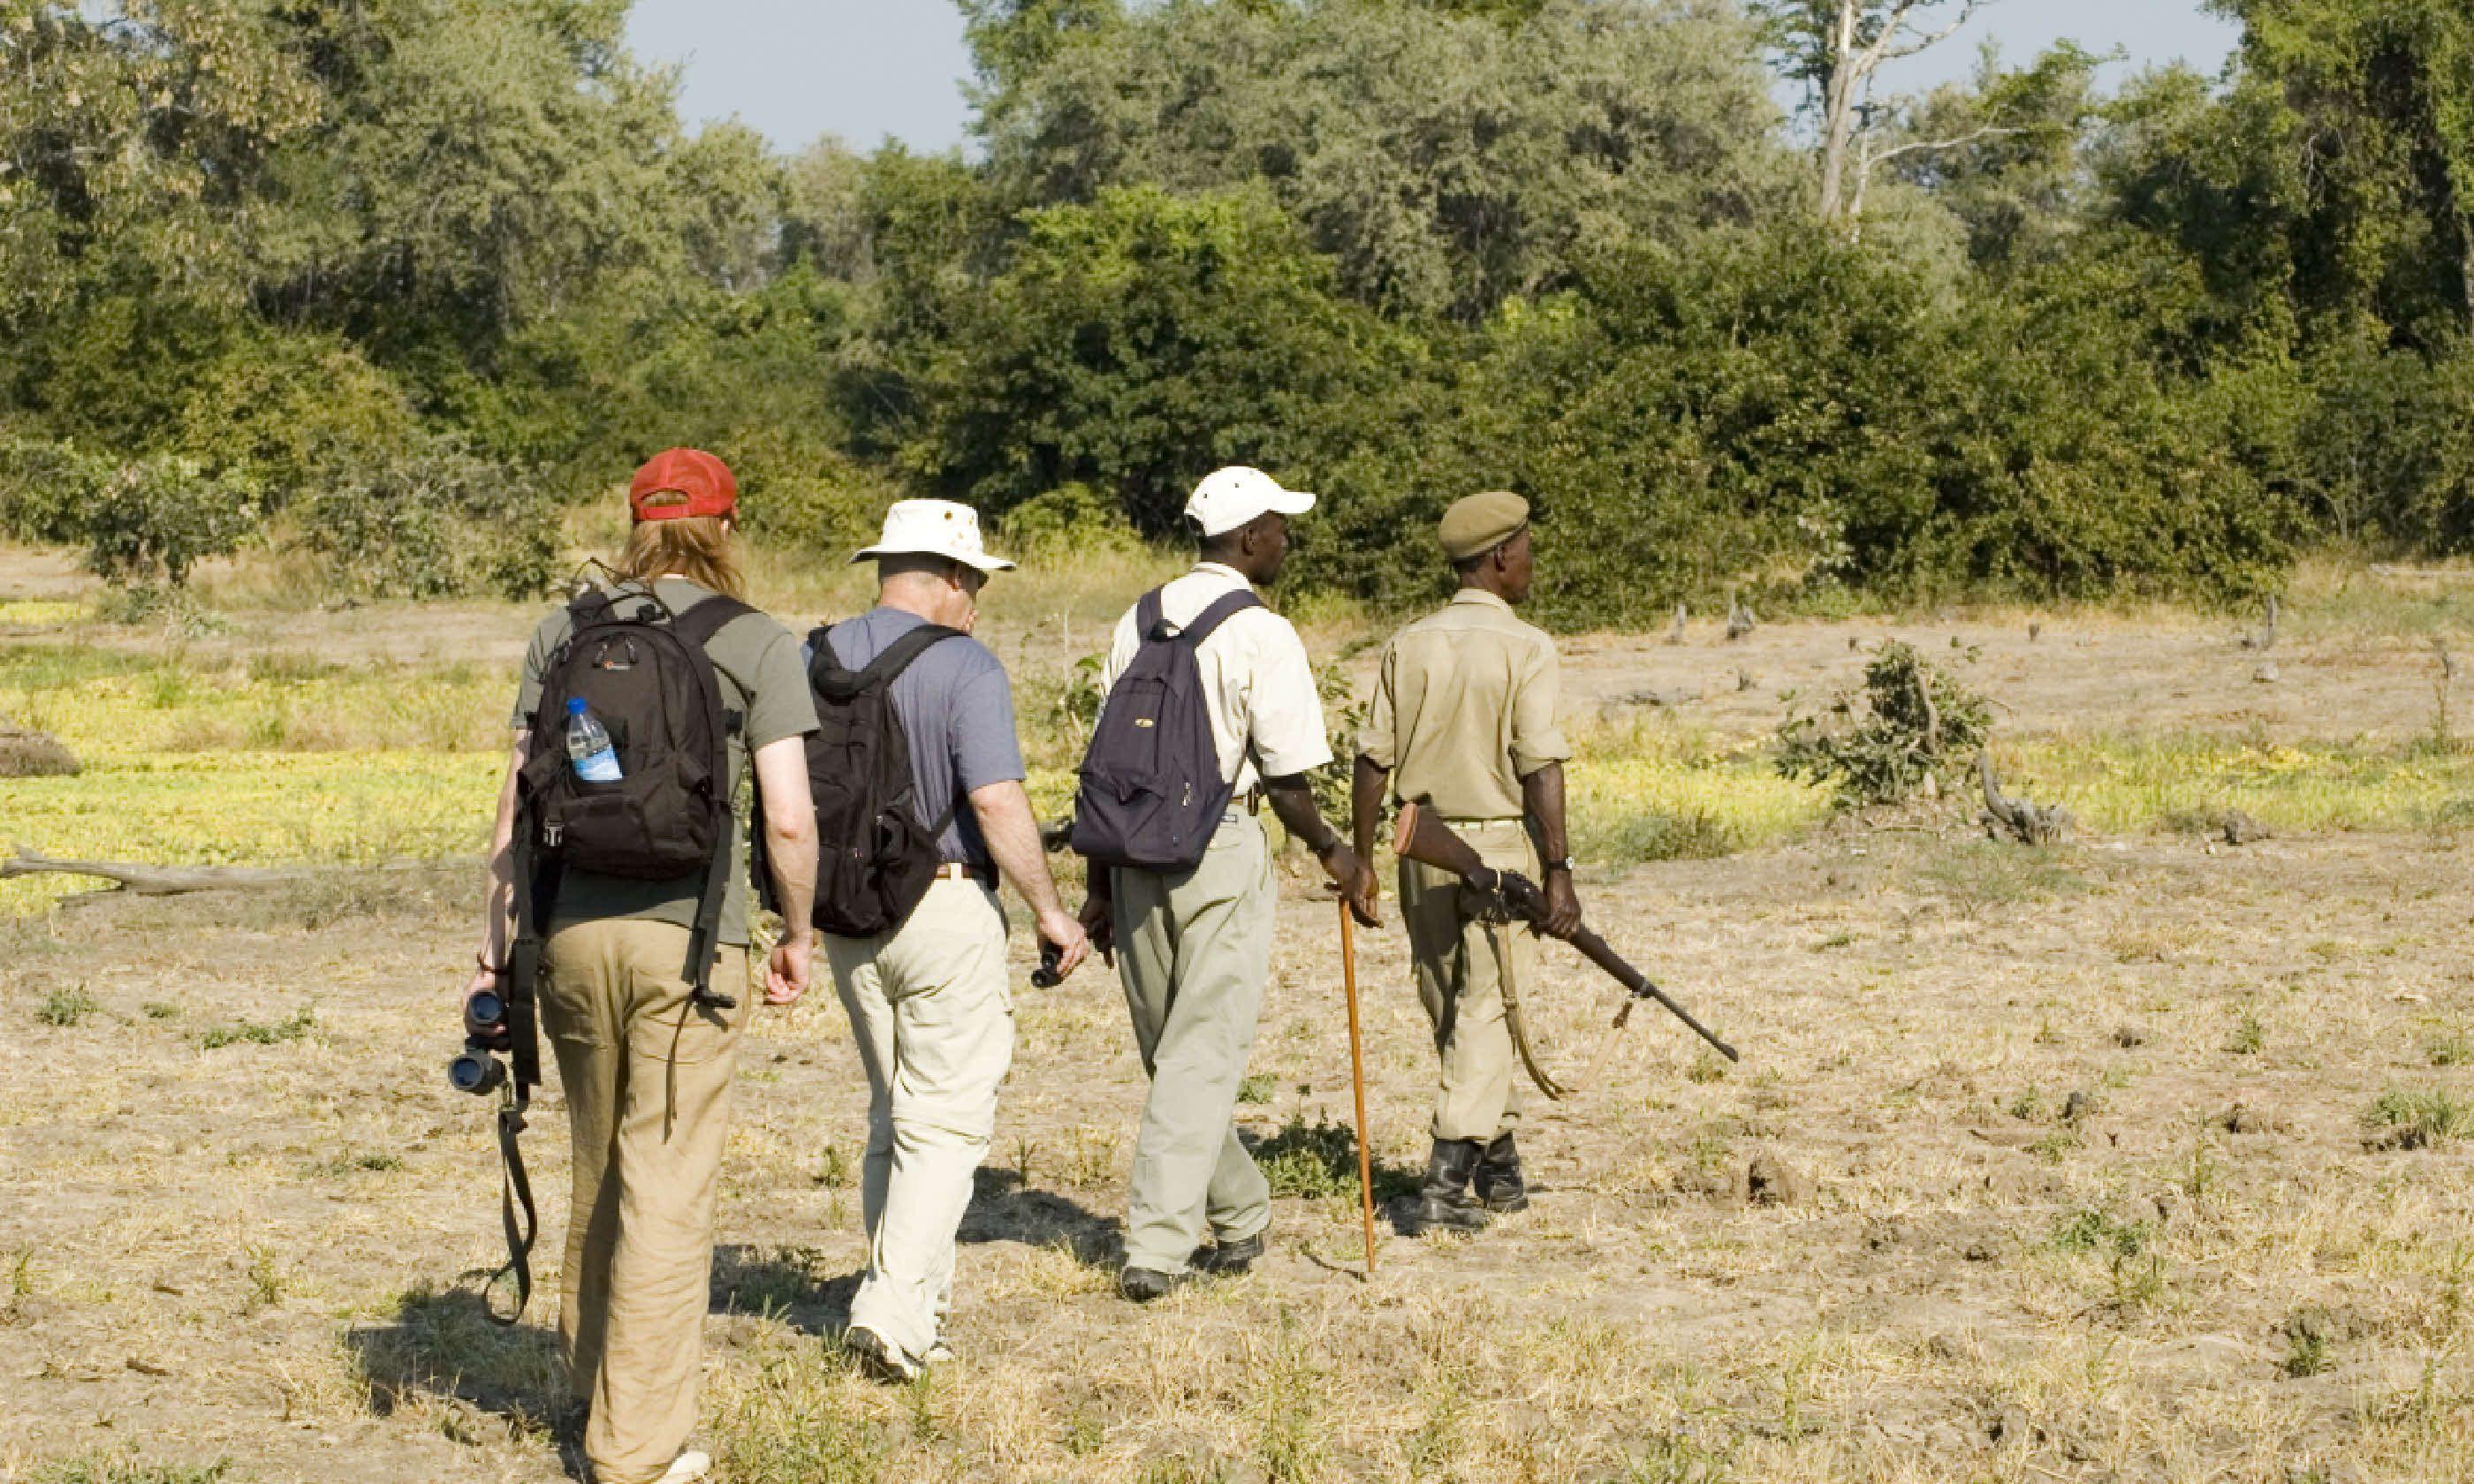 Walking safari in South Luangwa National Park (Shutterstock)